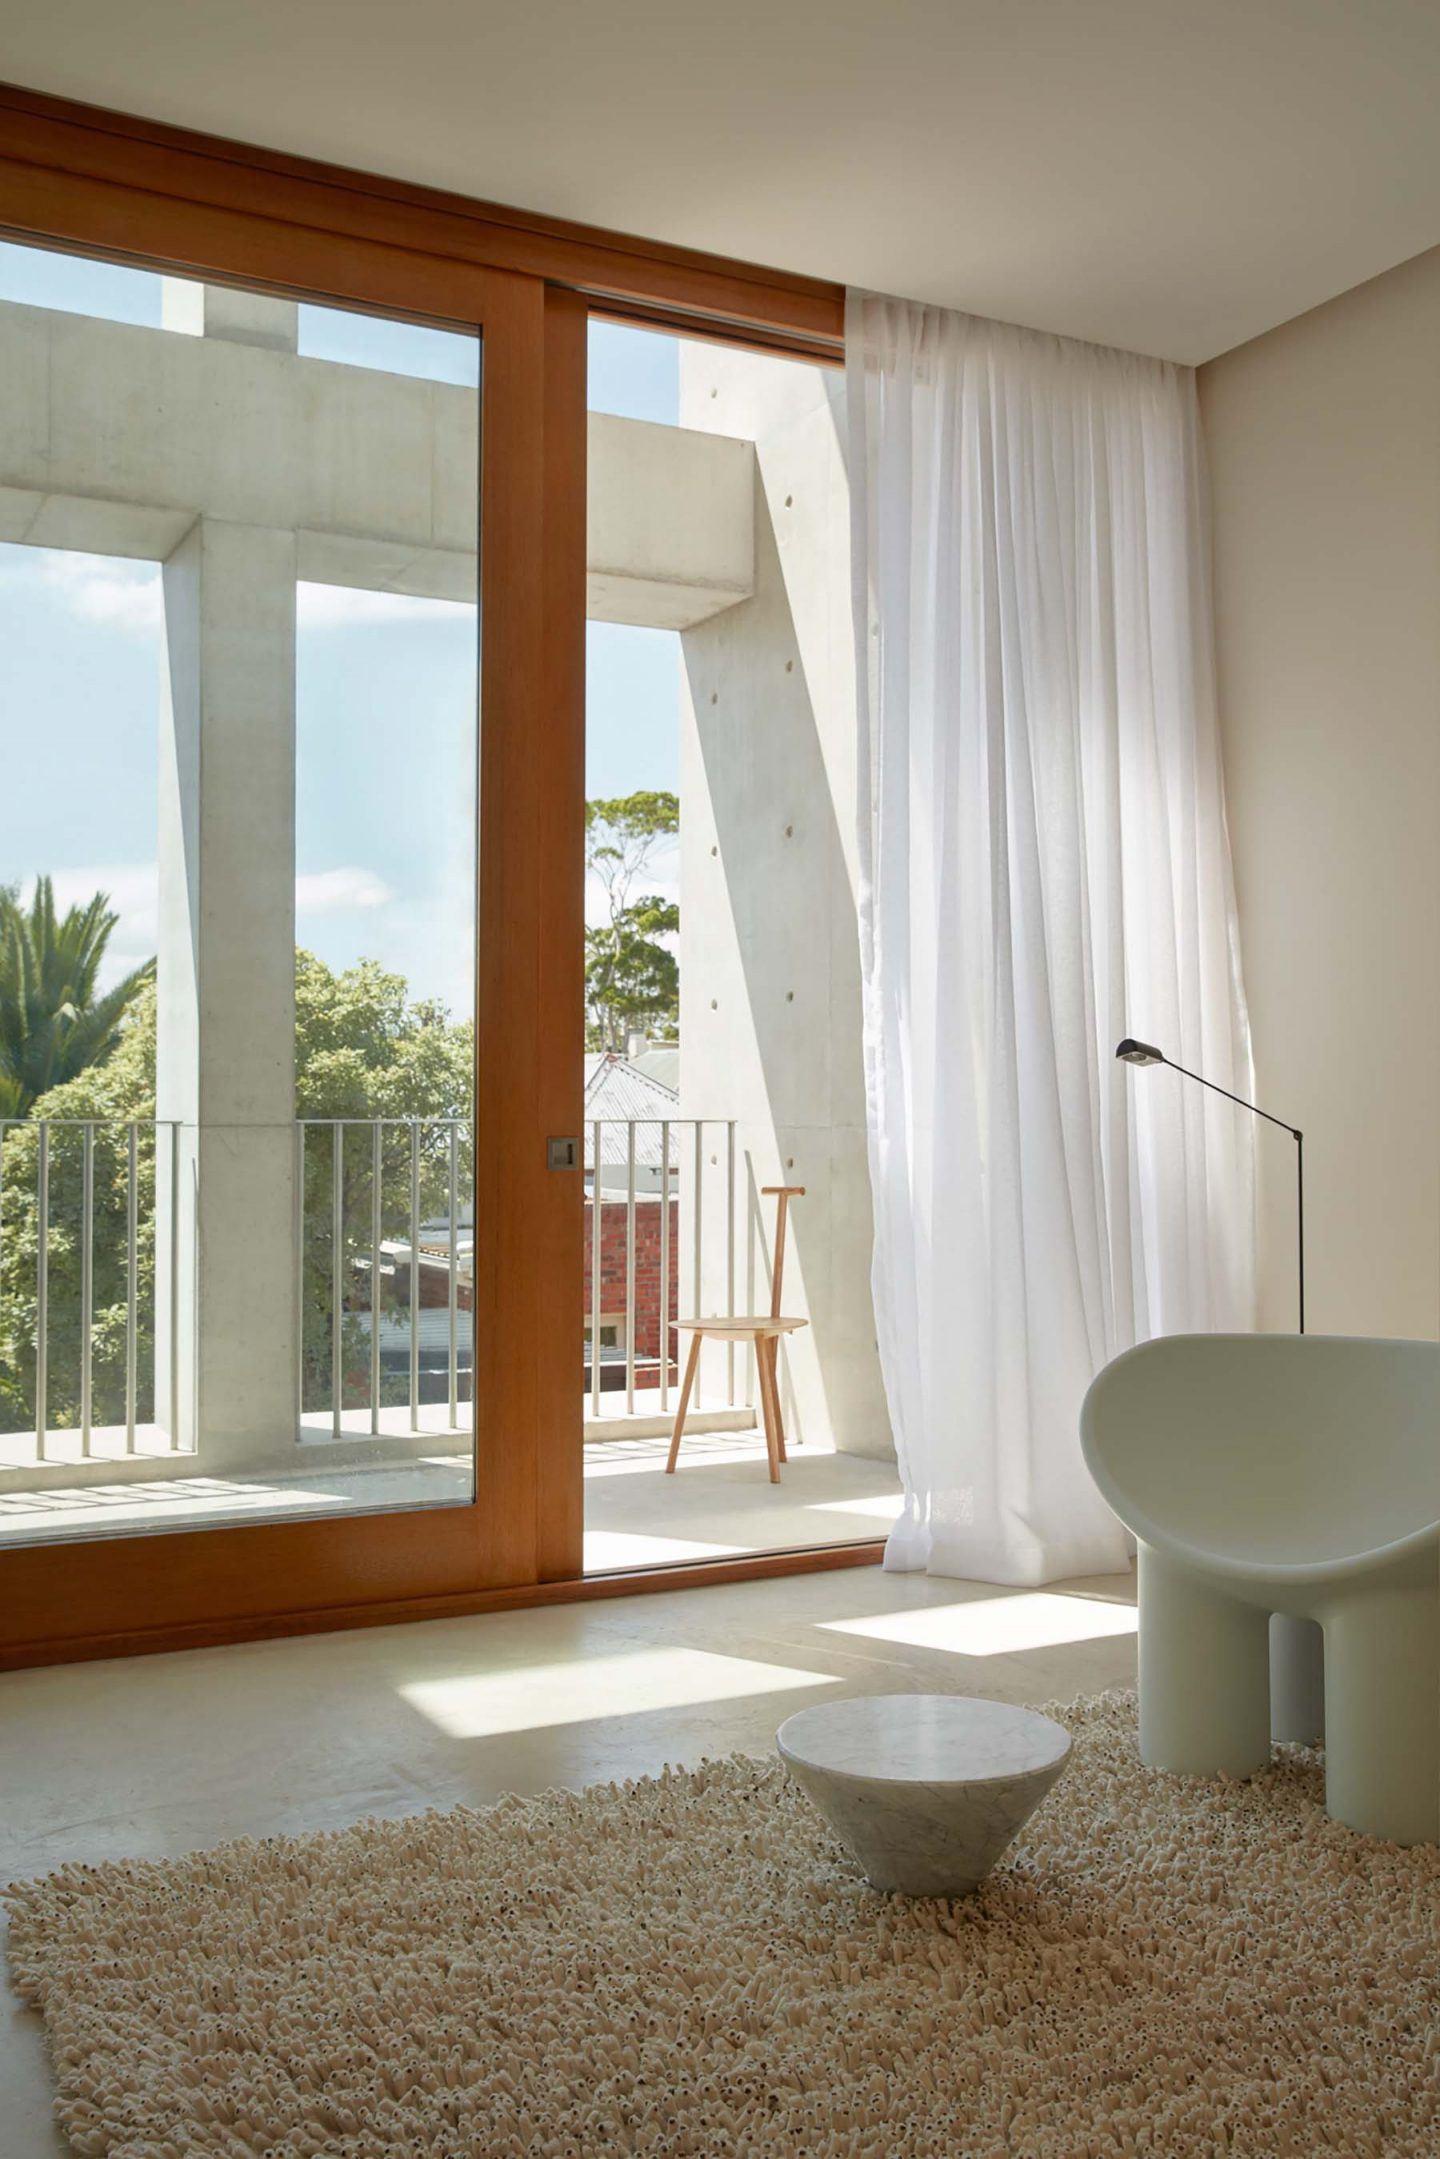 IGNANT-Architecture-Oliver-du-Puy-Architects-Skinny-House-13